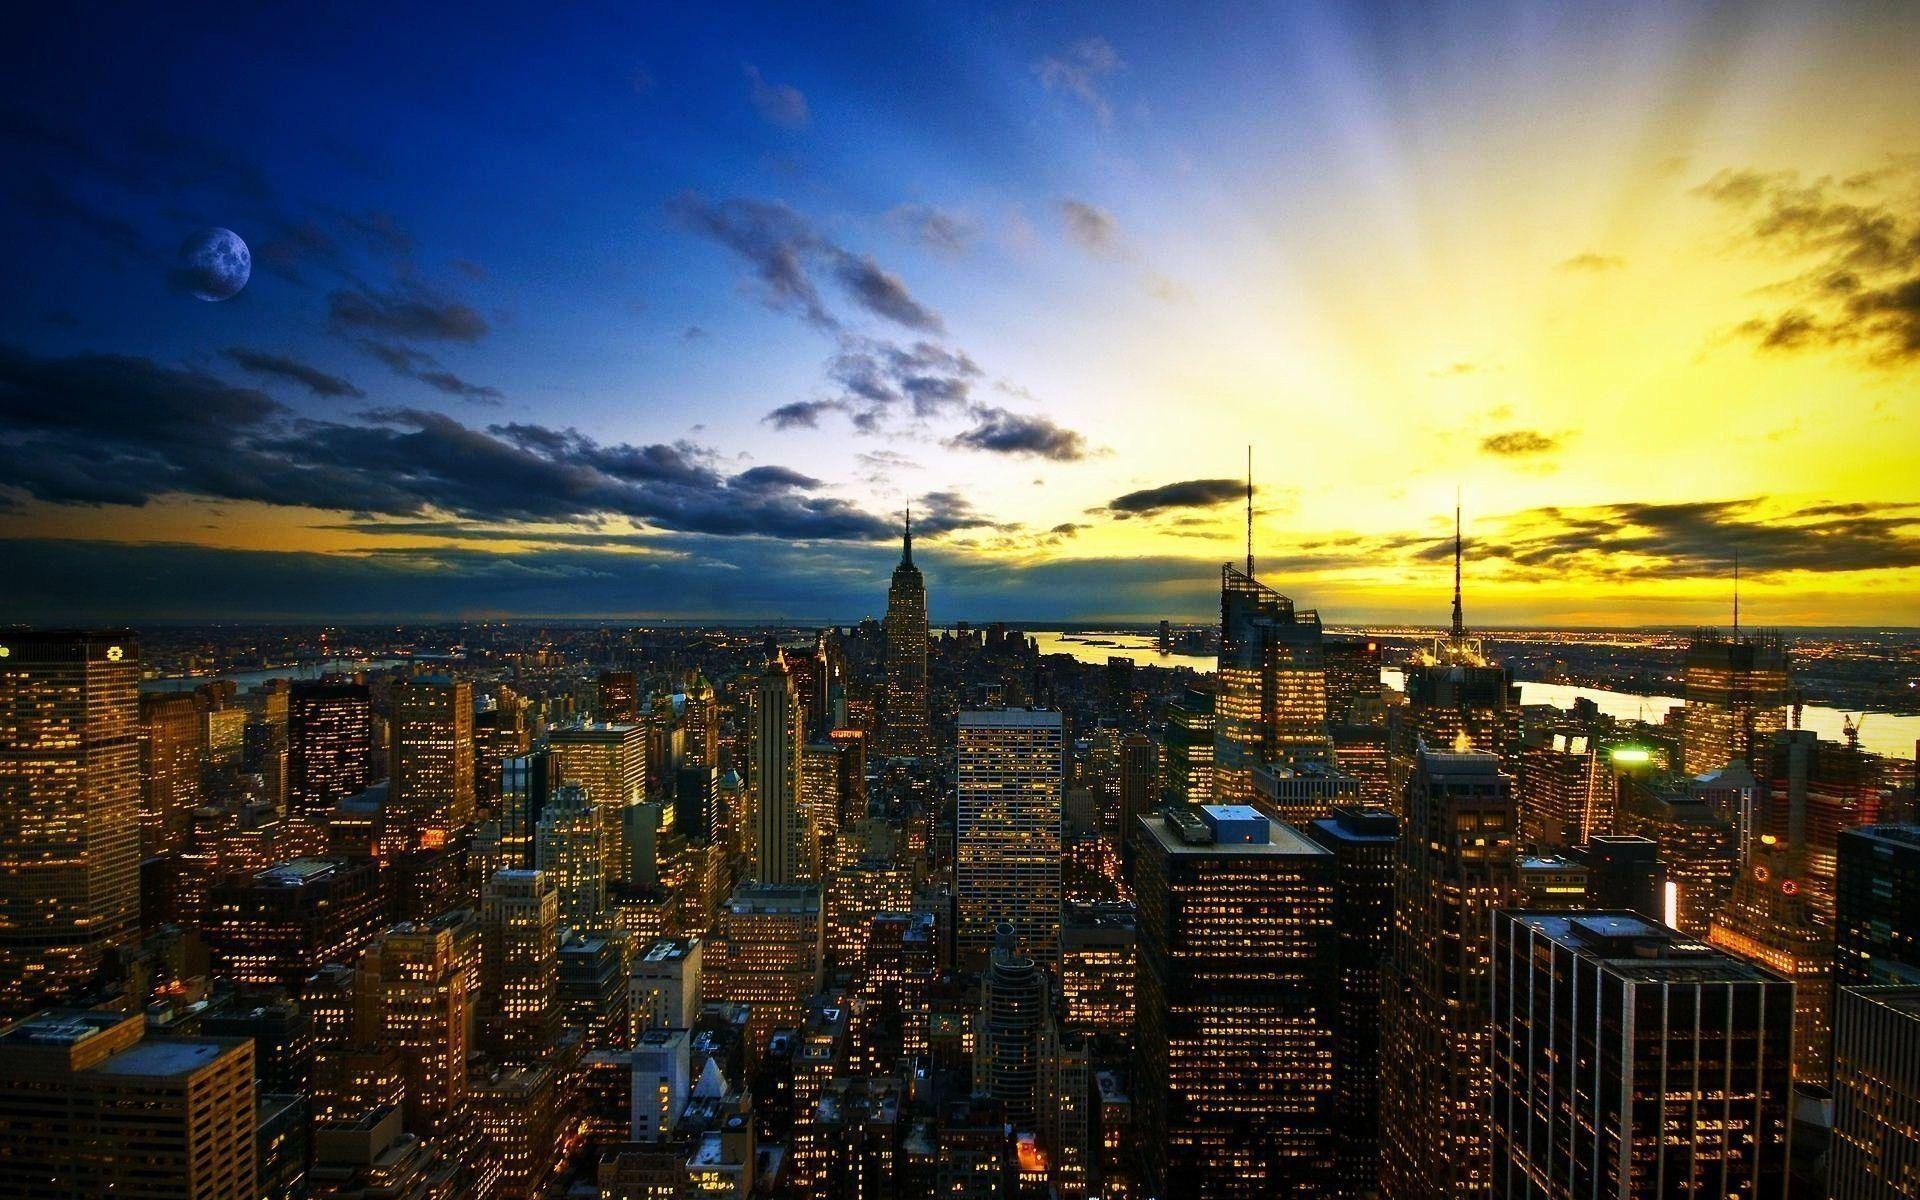 10 Latest City Skyline Desktop Wallpaper Full Hd 1920 1080 For Pc Desktop New York Wallpaper City Wallpaper Usa Wallpaper